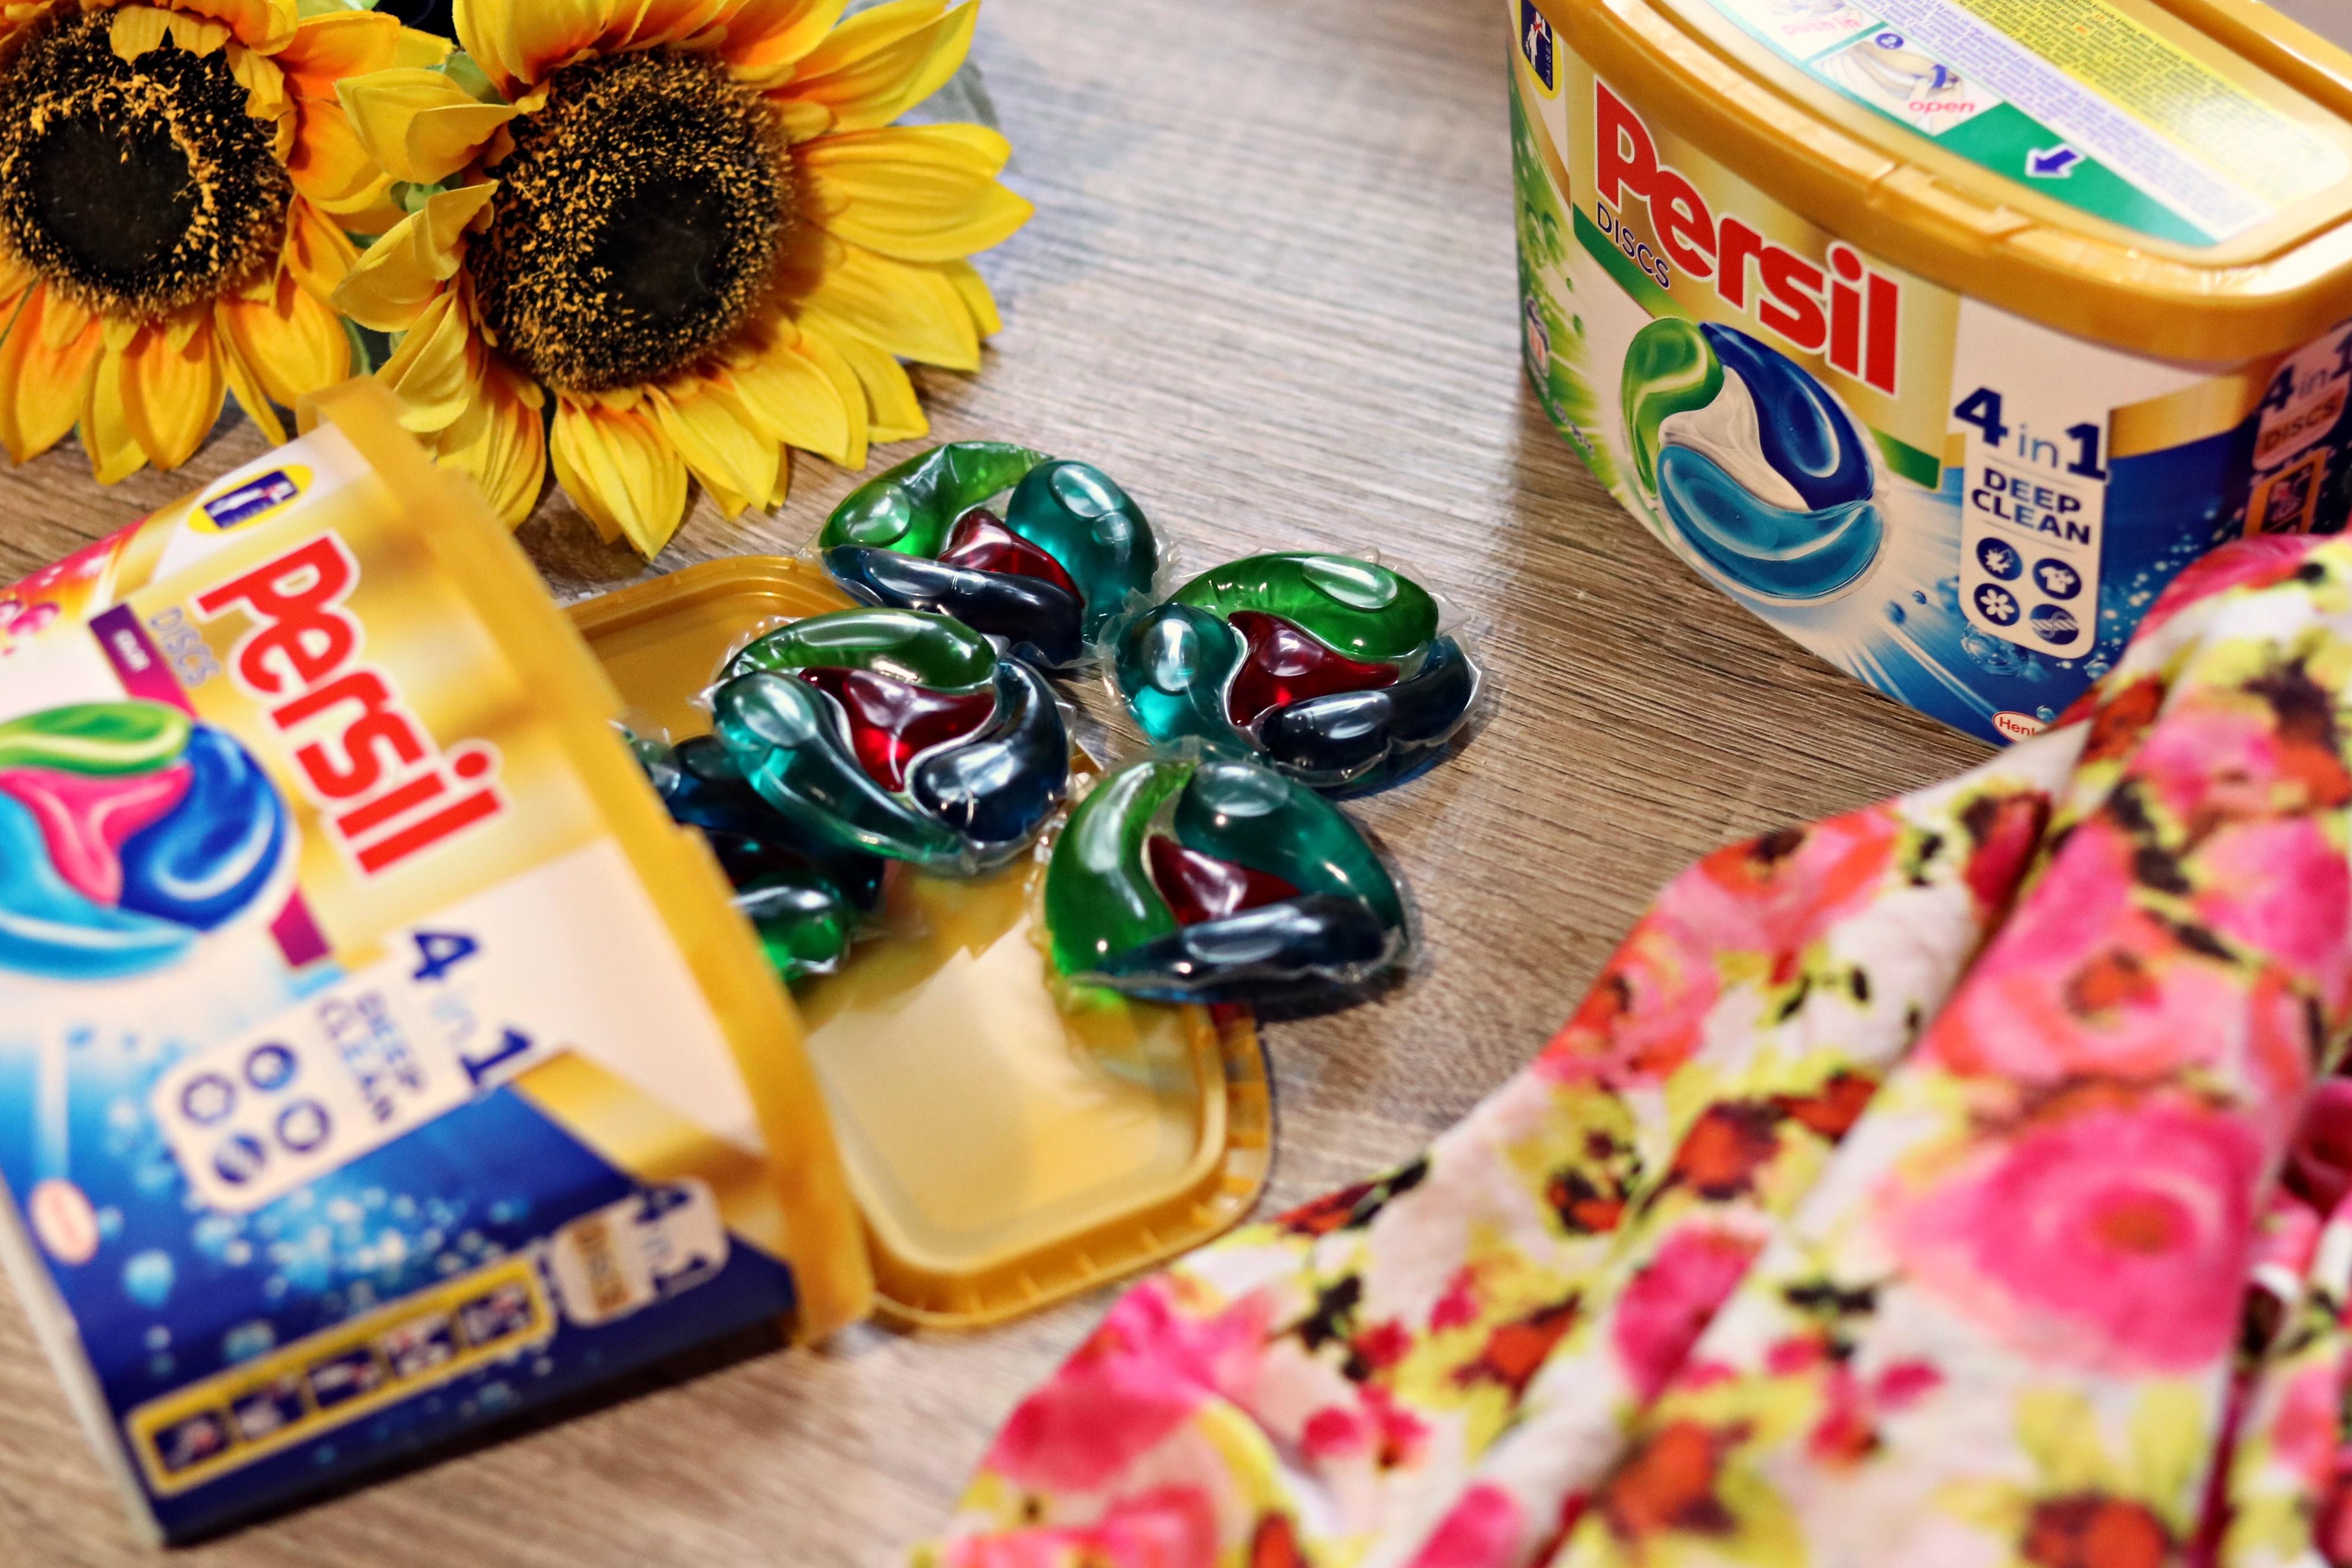 persil pods detergent